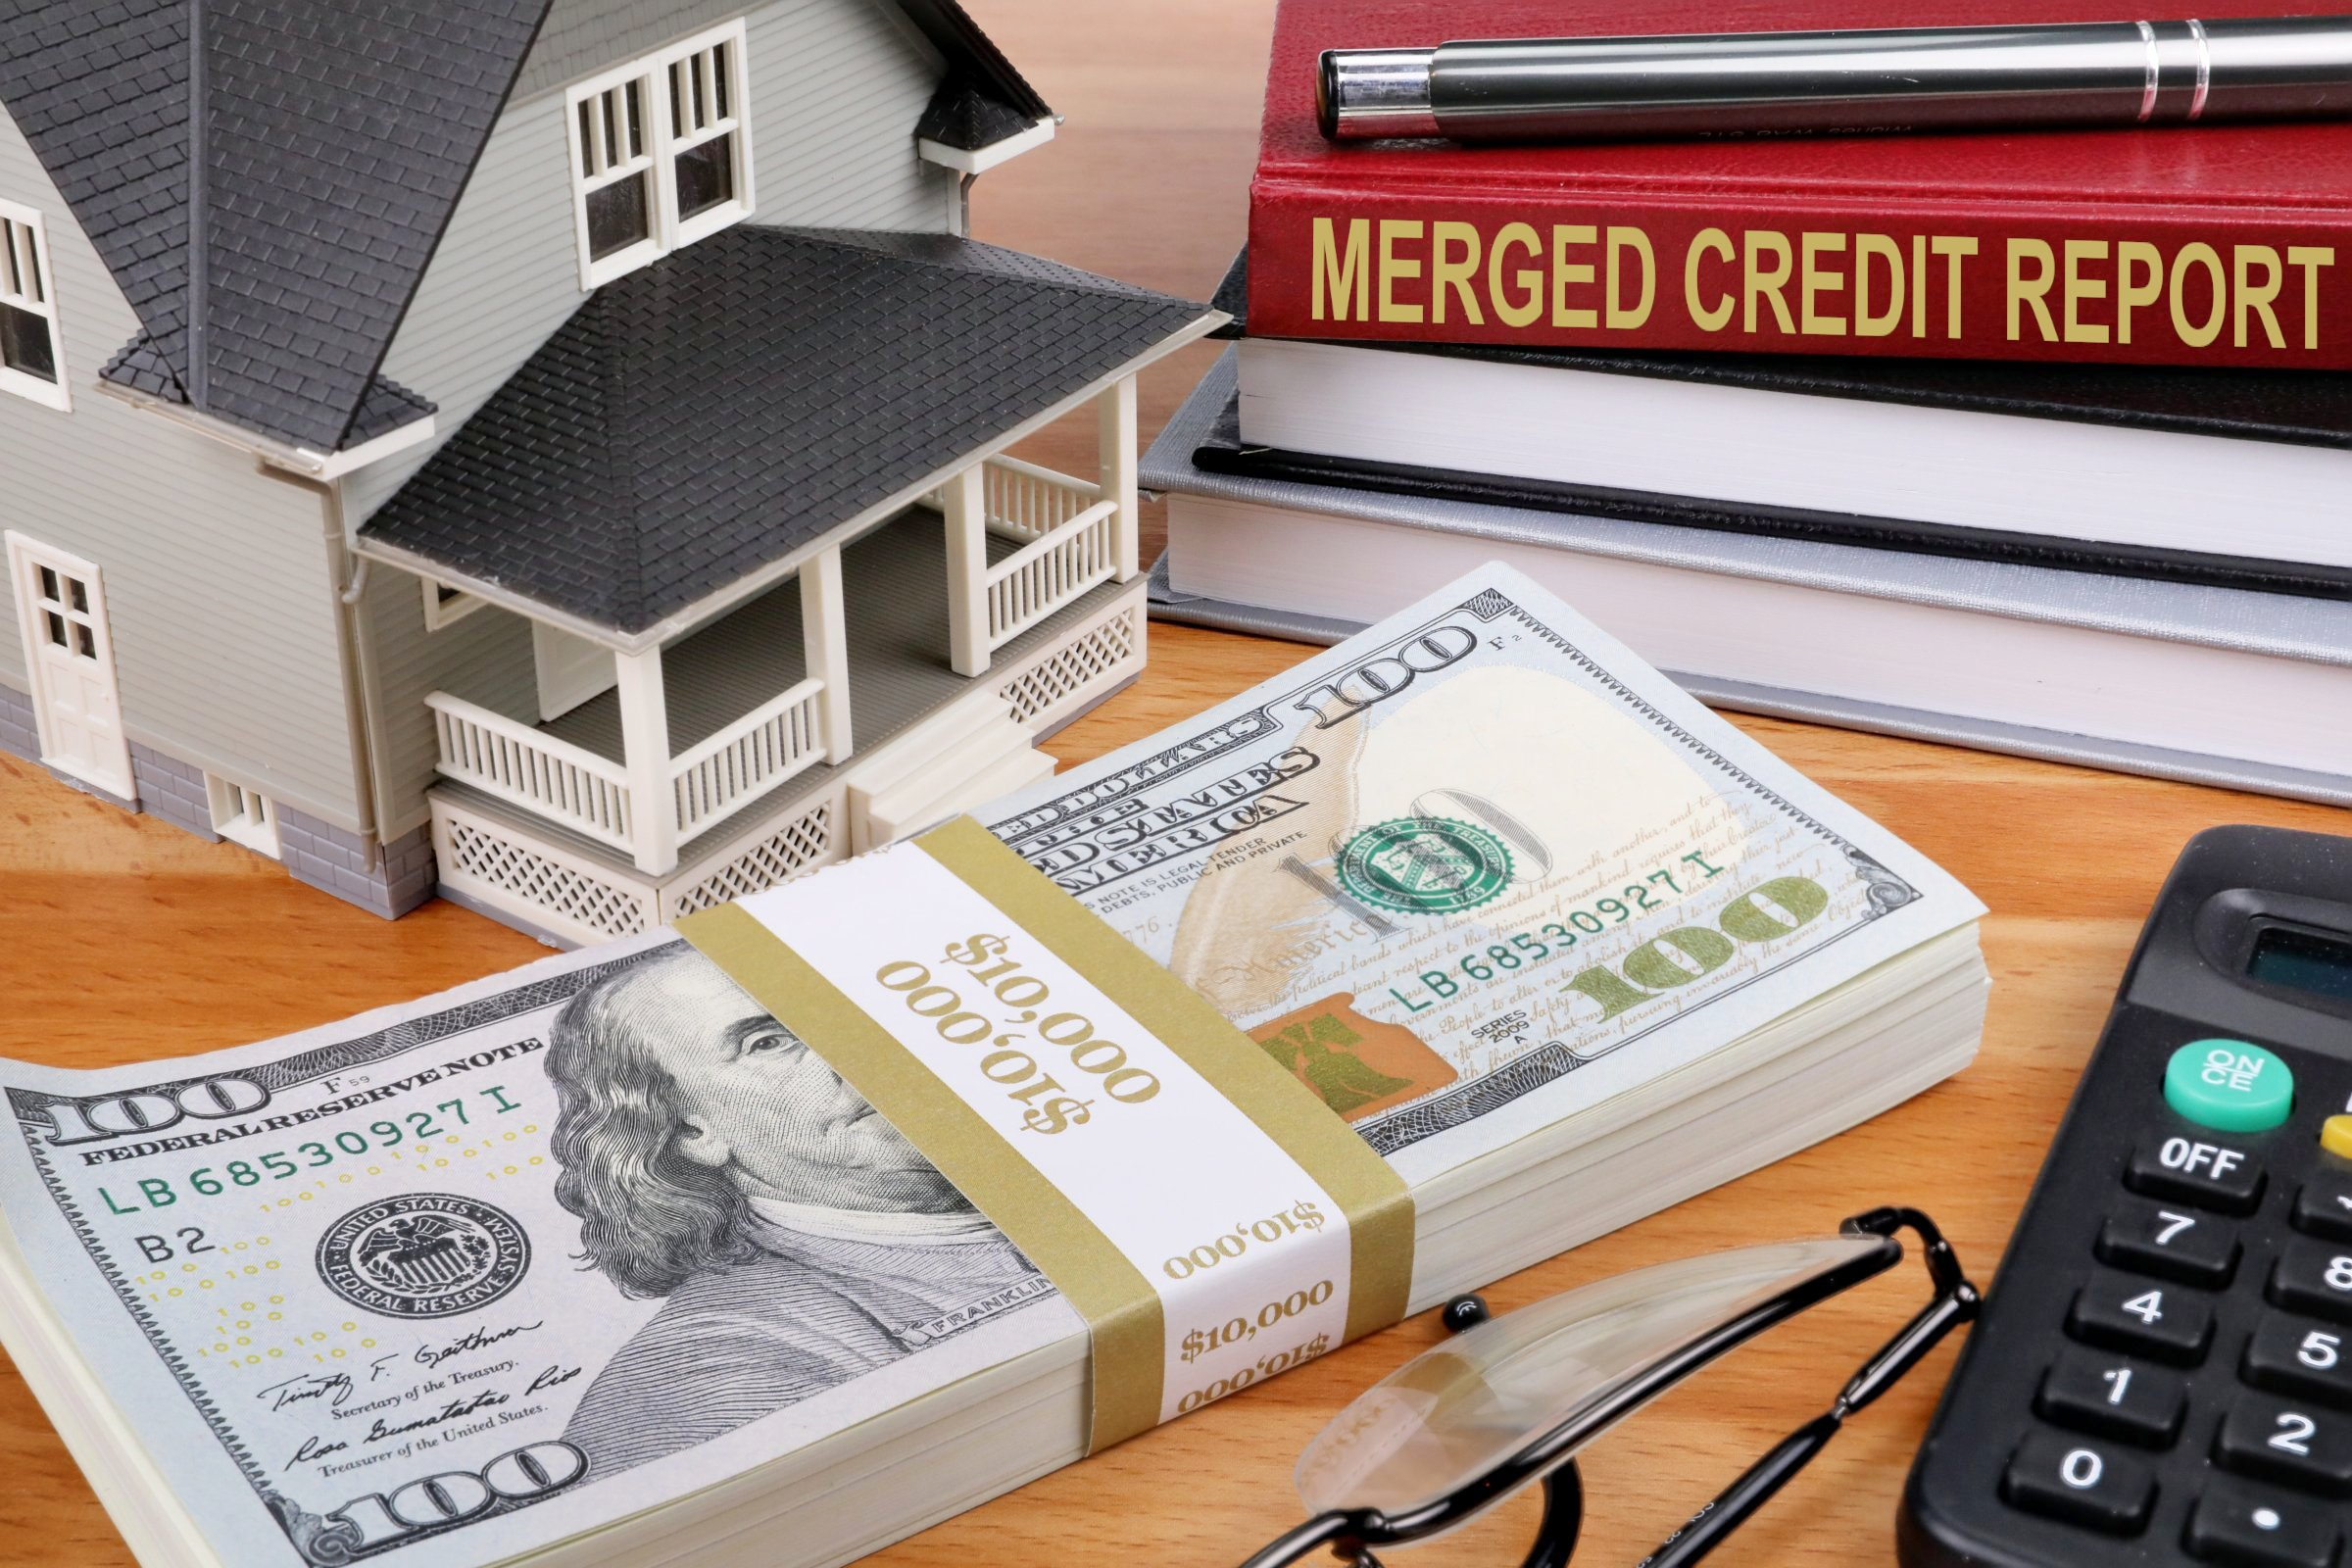 Merged Credit Report